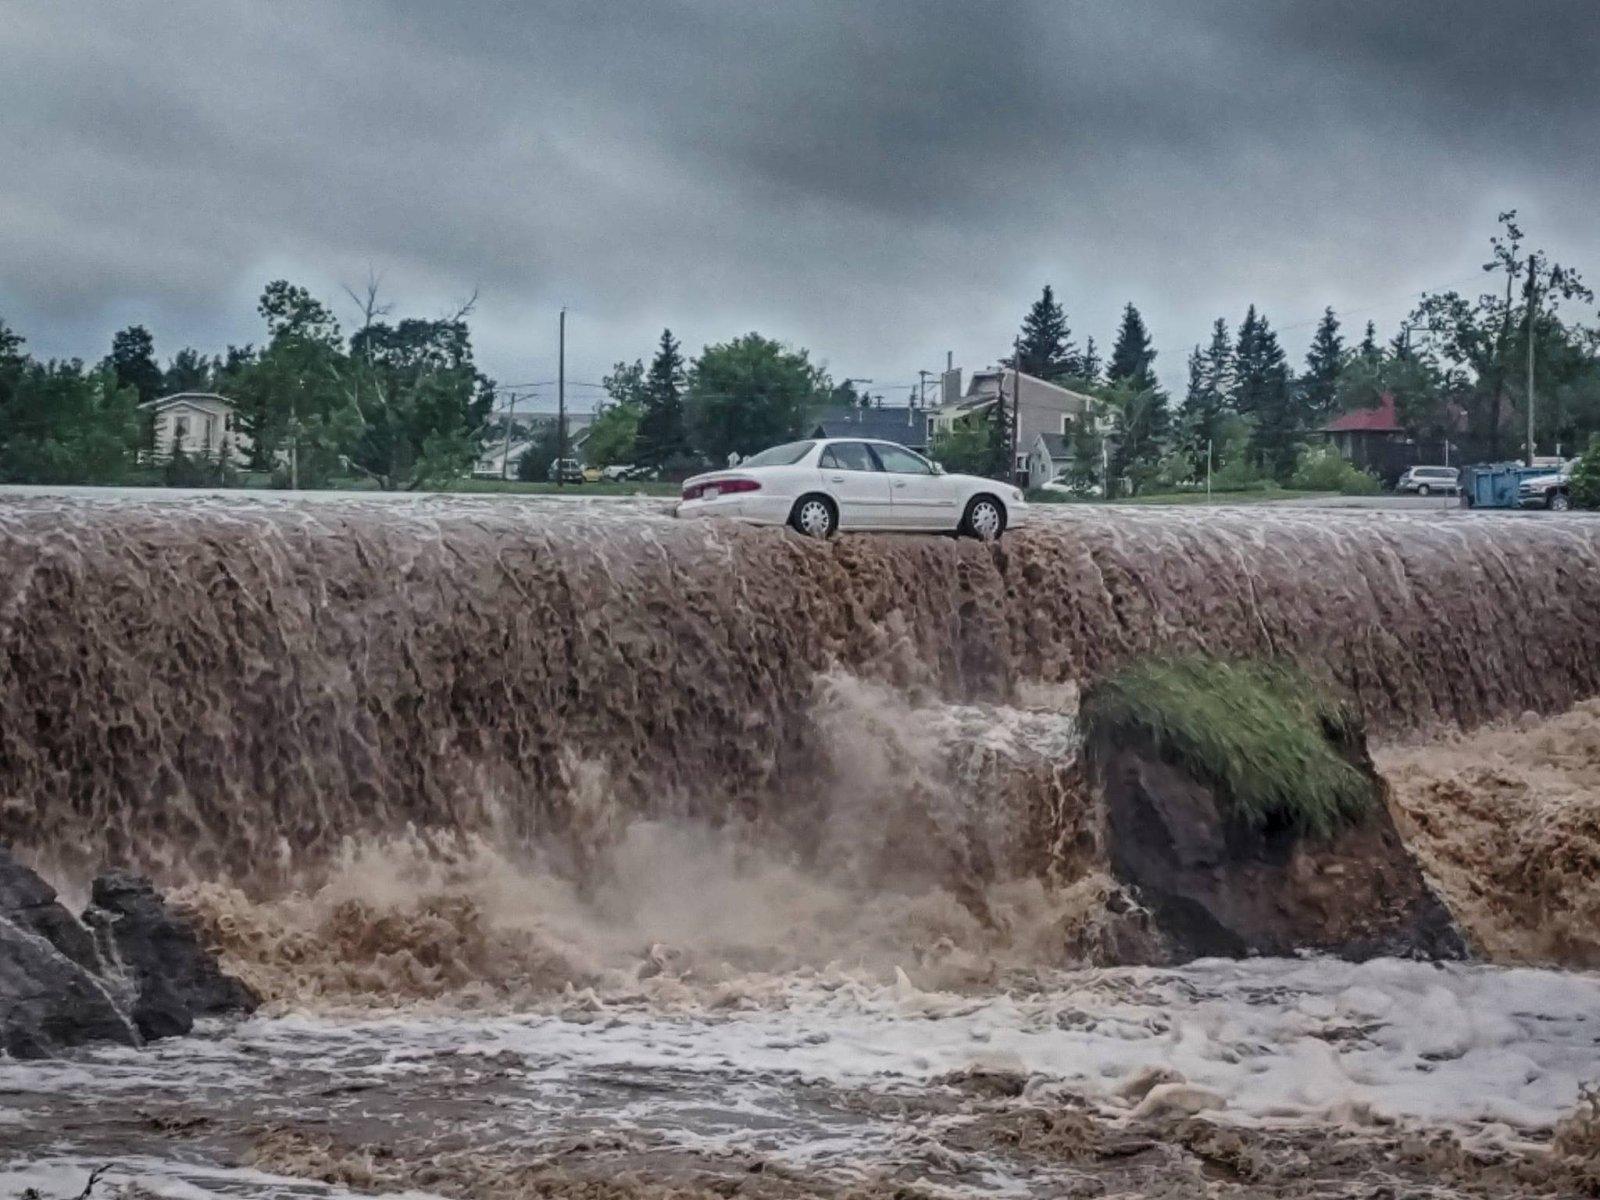 Click image for larger version  Name:Dawson Creek flooding.jpg Views:49 Size:297.6 KB ID:130420